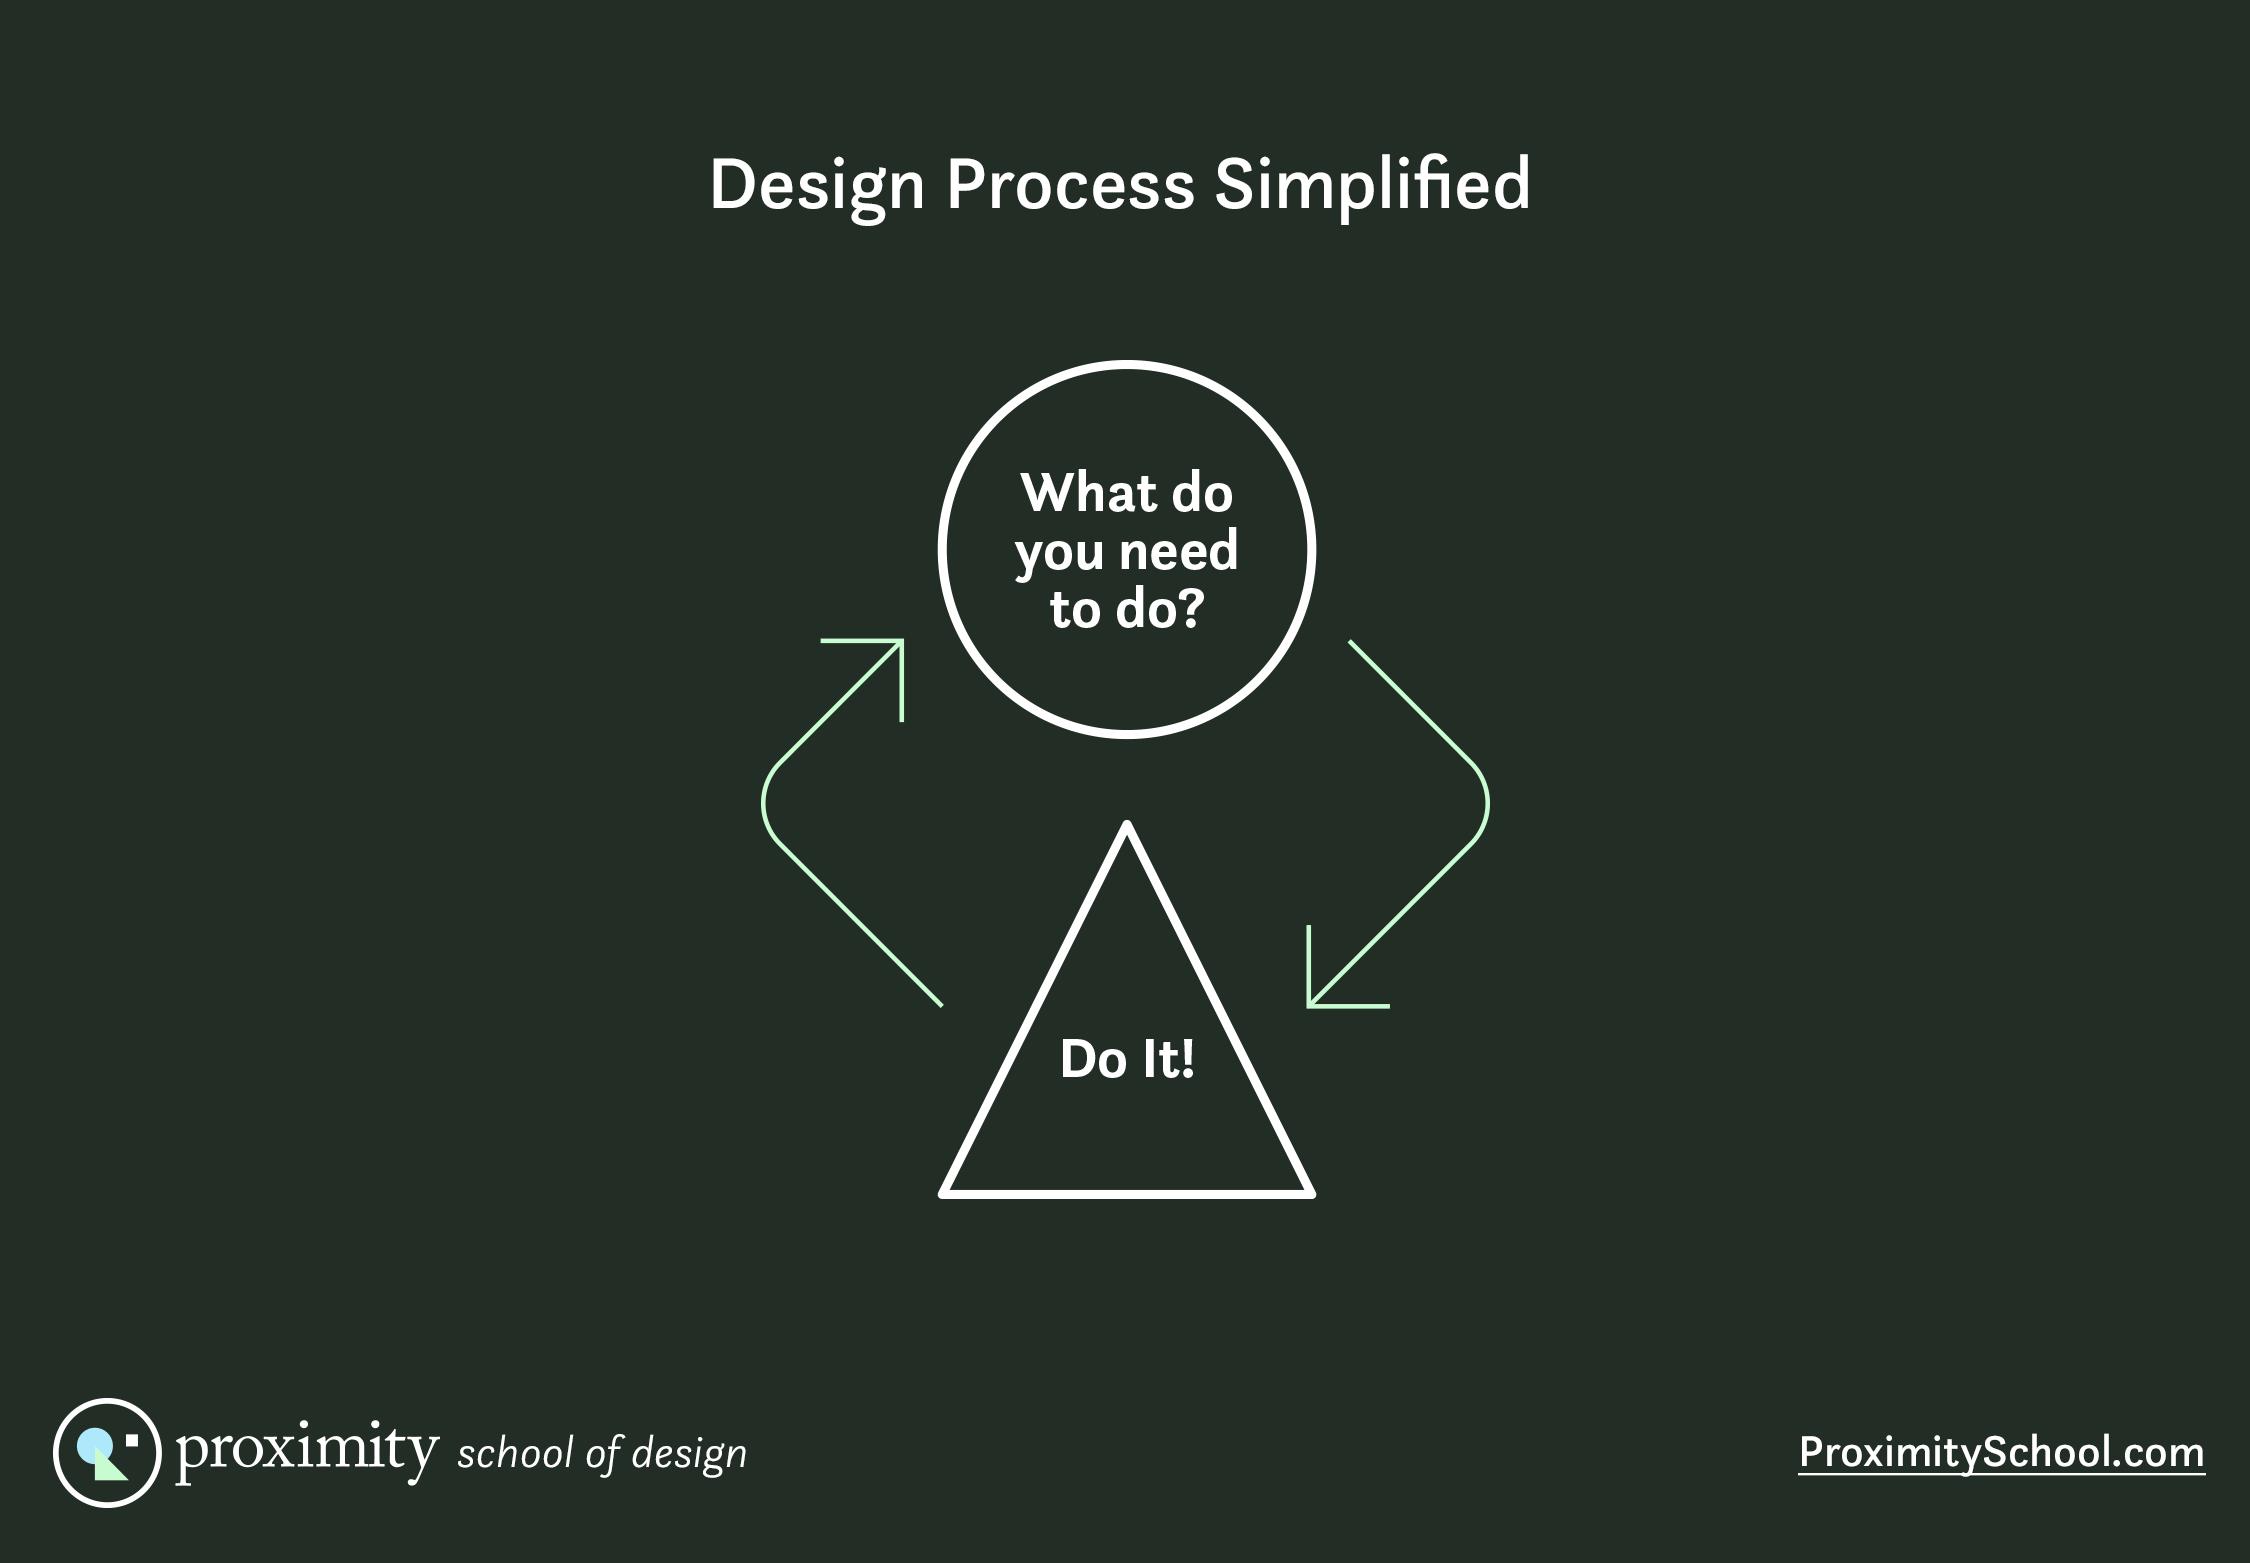 design process simplified diagram